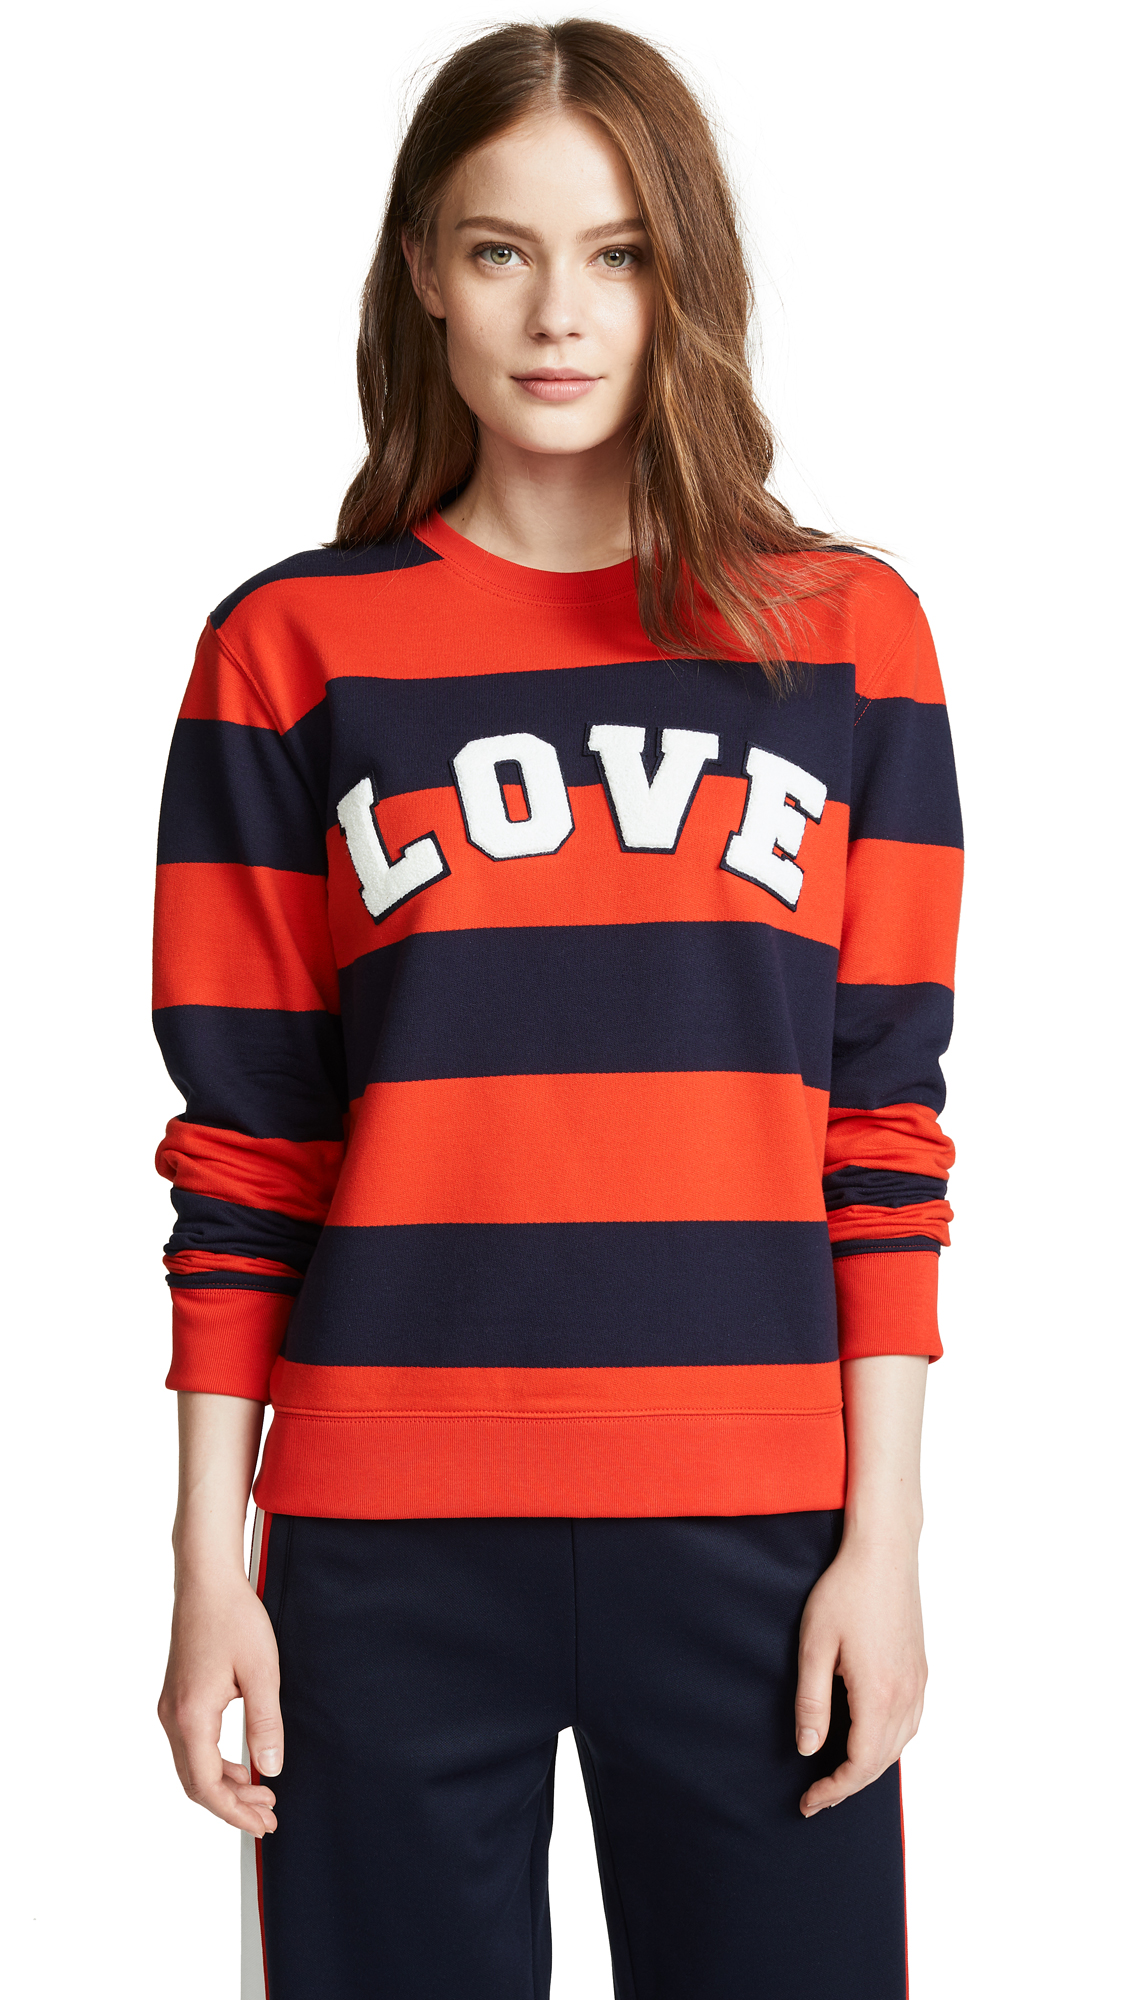 Love Striped Yarn-Dyed Graphic Sweatshirt in Red Broad Stripe